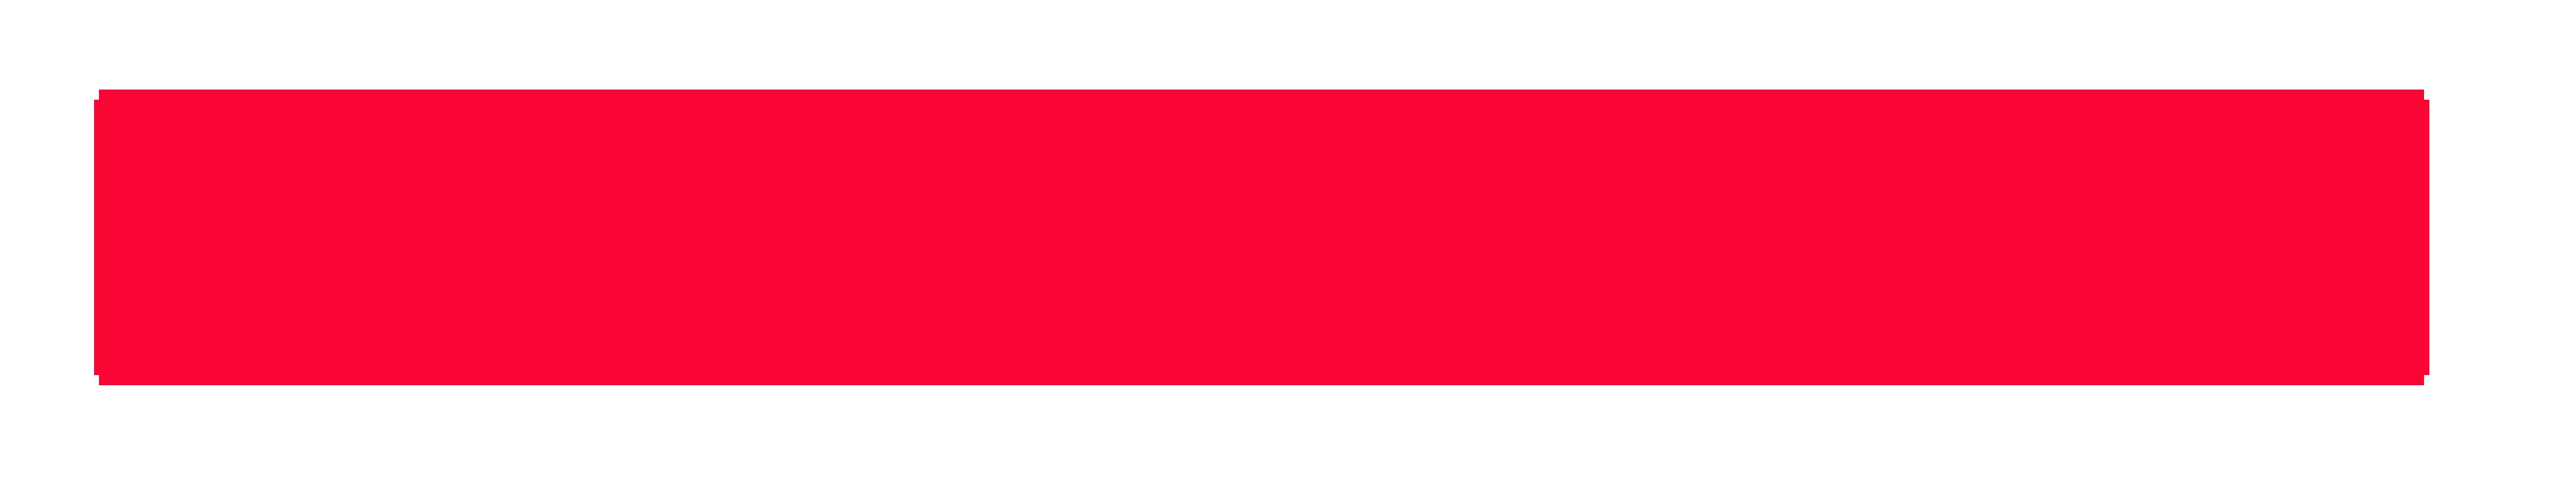 RG 700 pixel